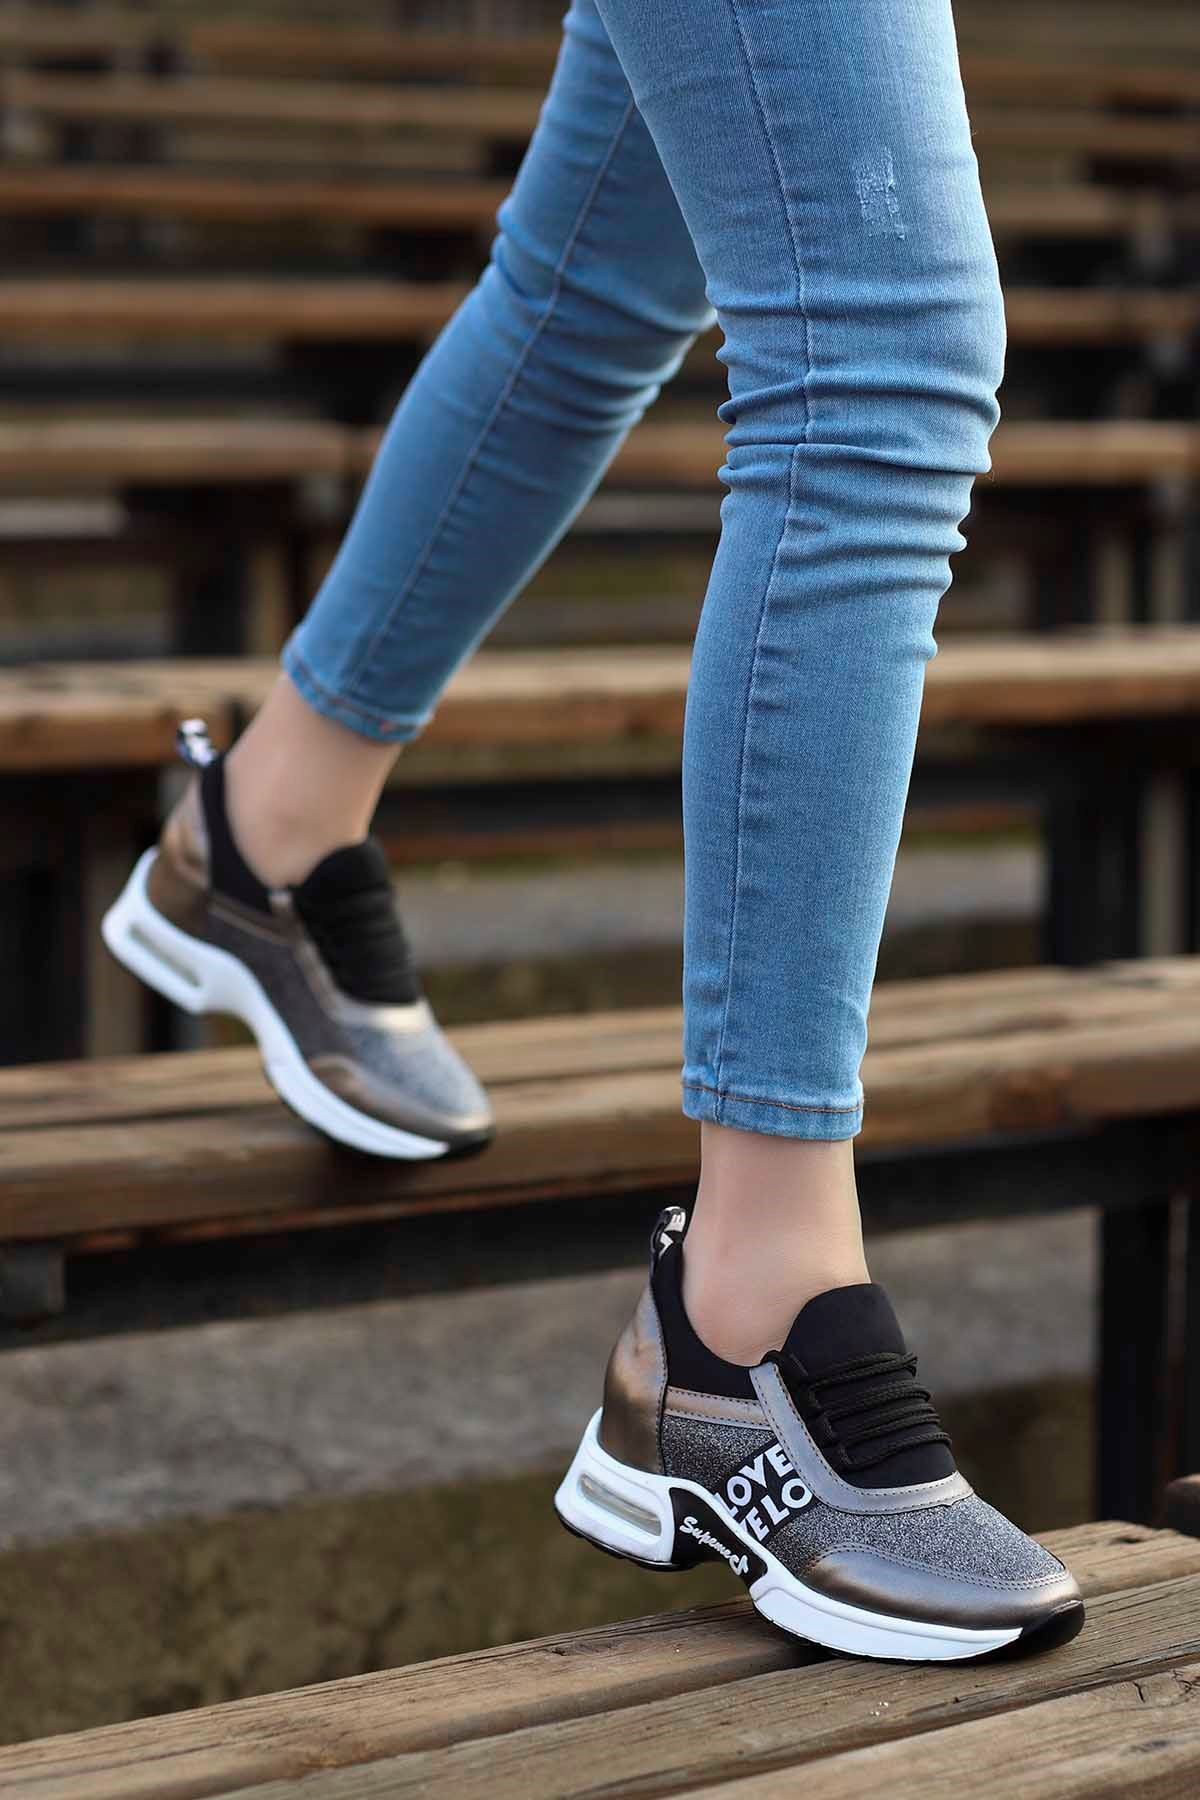 Frm-300 Gizli Topuk Spor Ayakkabı Platin